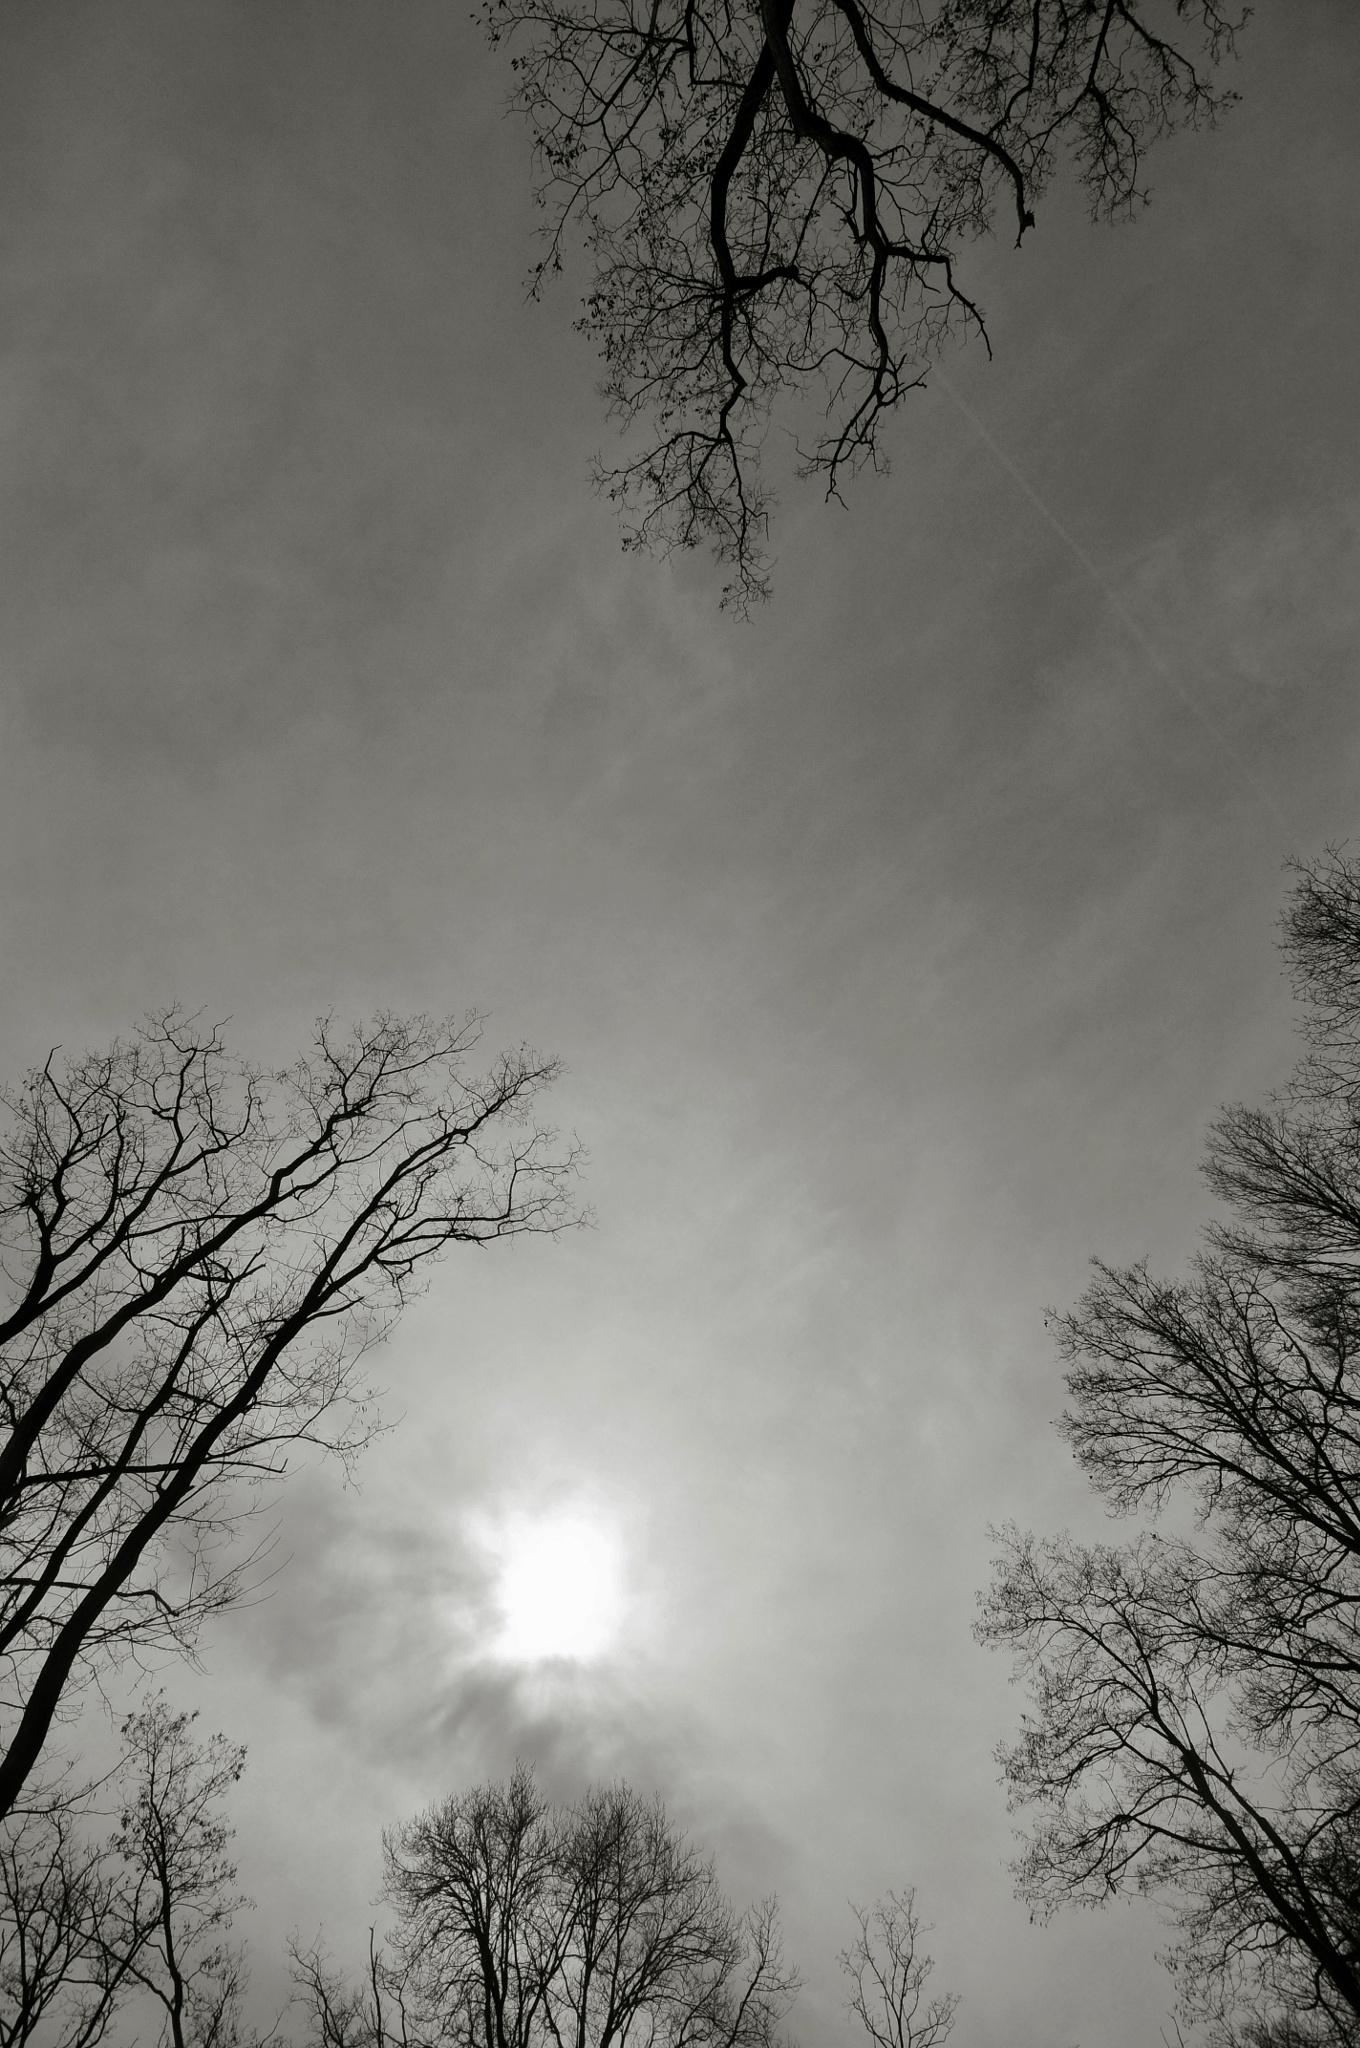 Looking up by JeanGregoireMarin